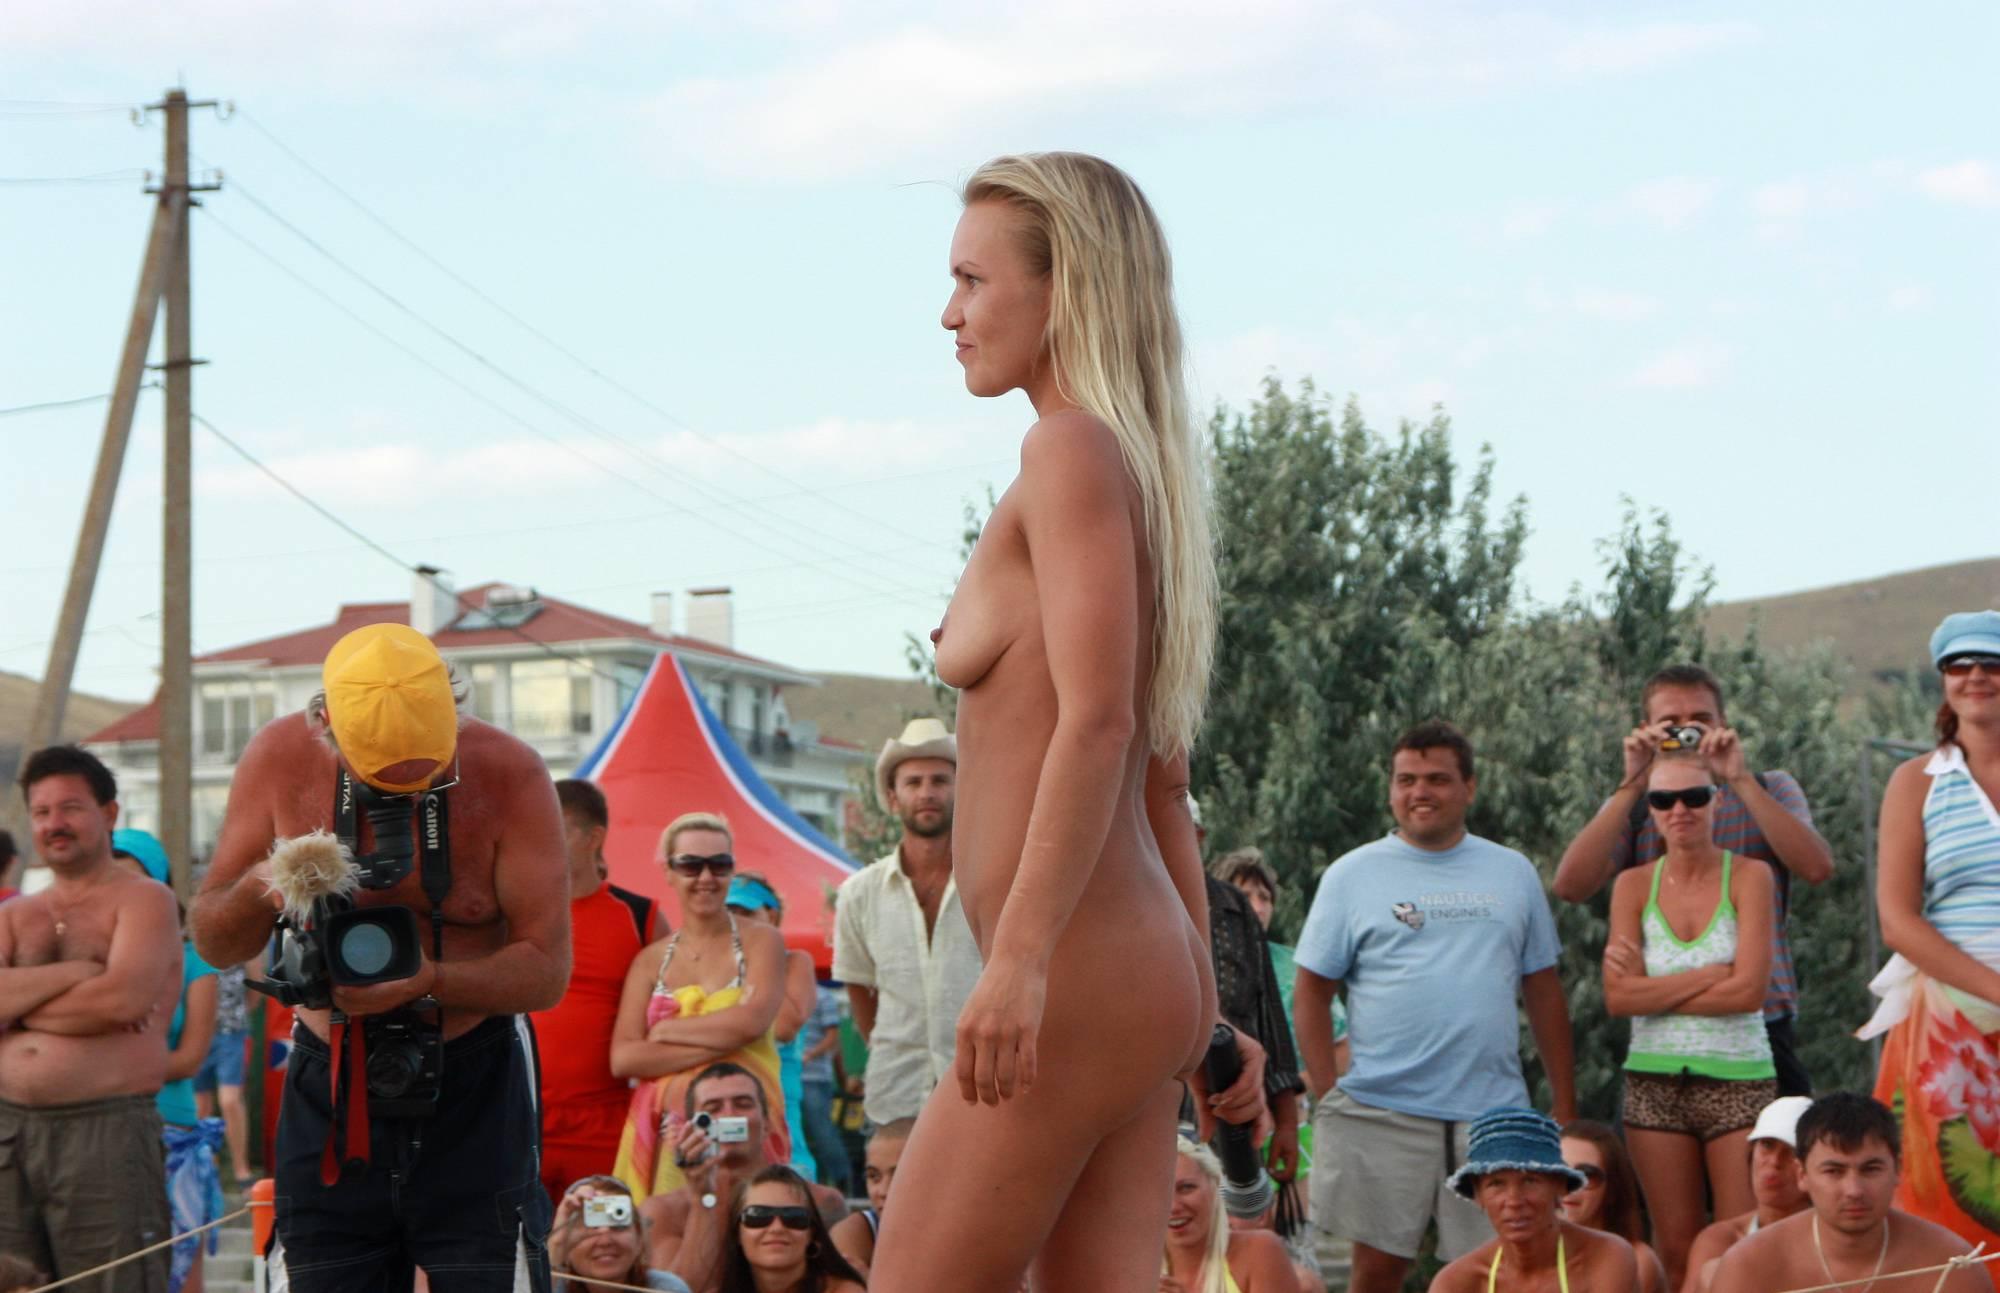 Pure Nudism Photos-Neptune Blonde Girl Dance - 2